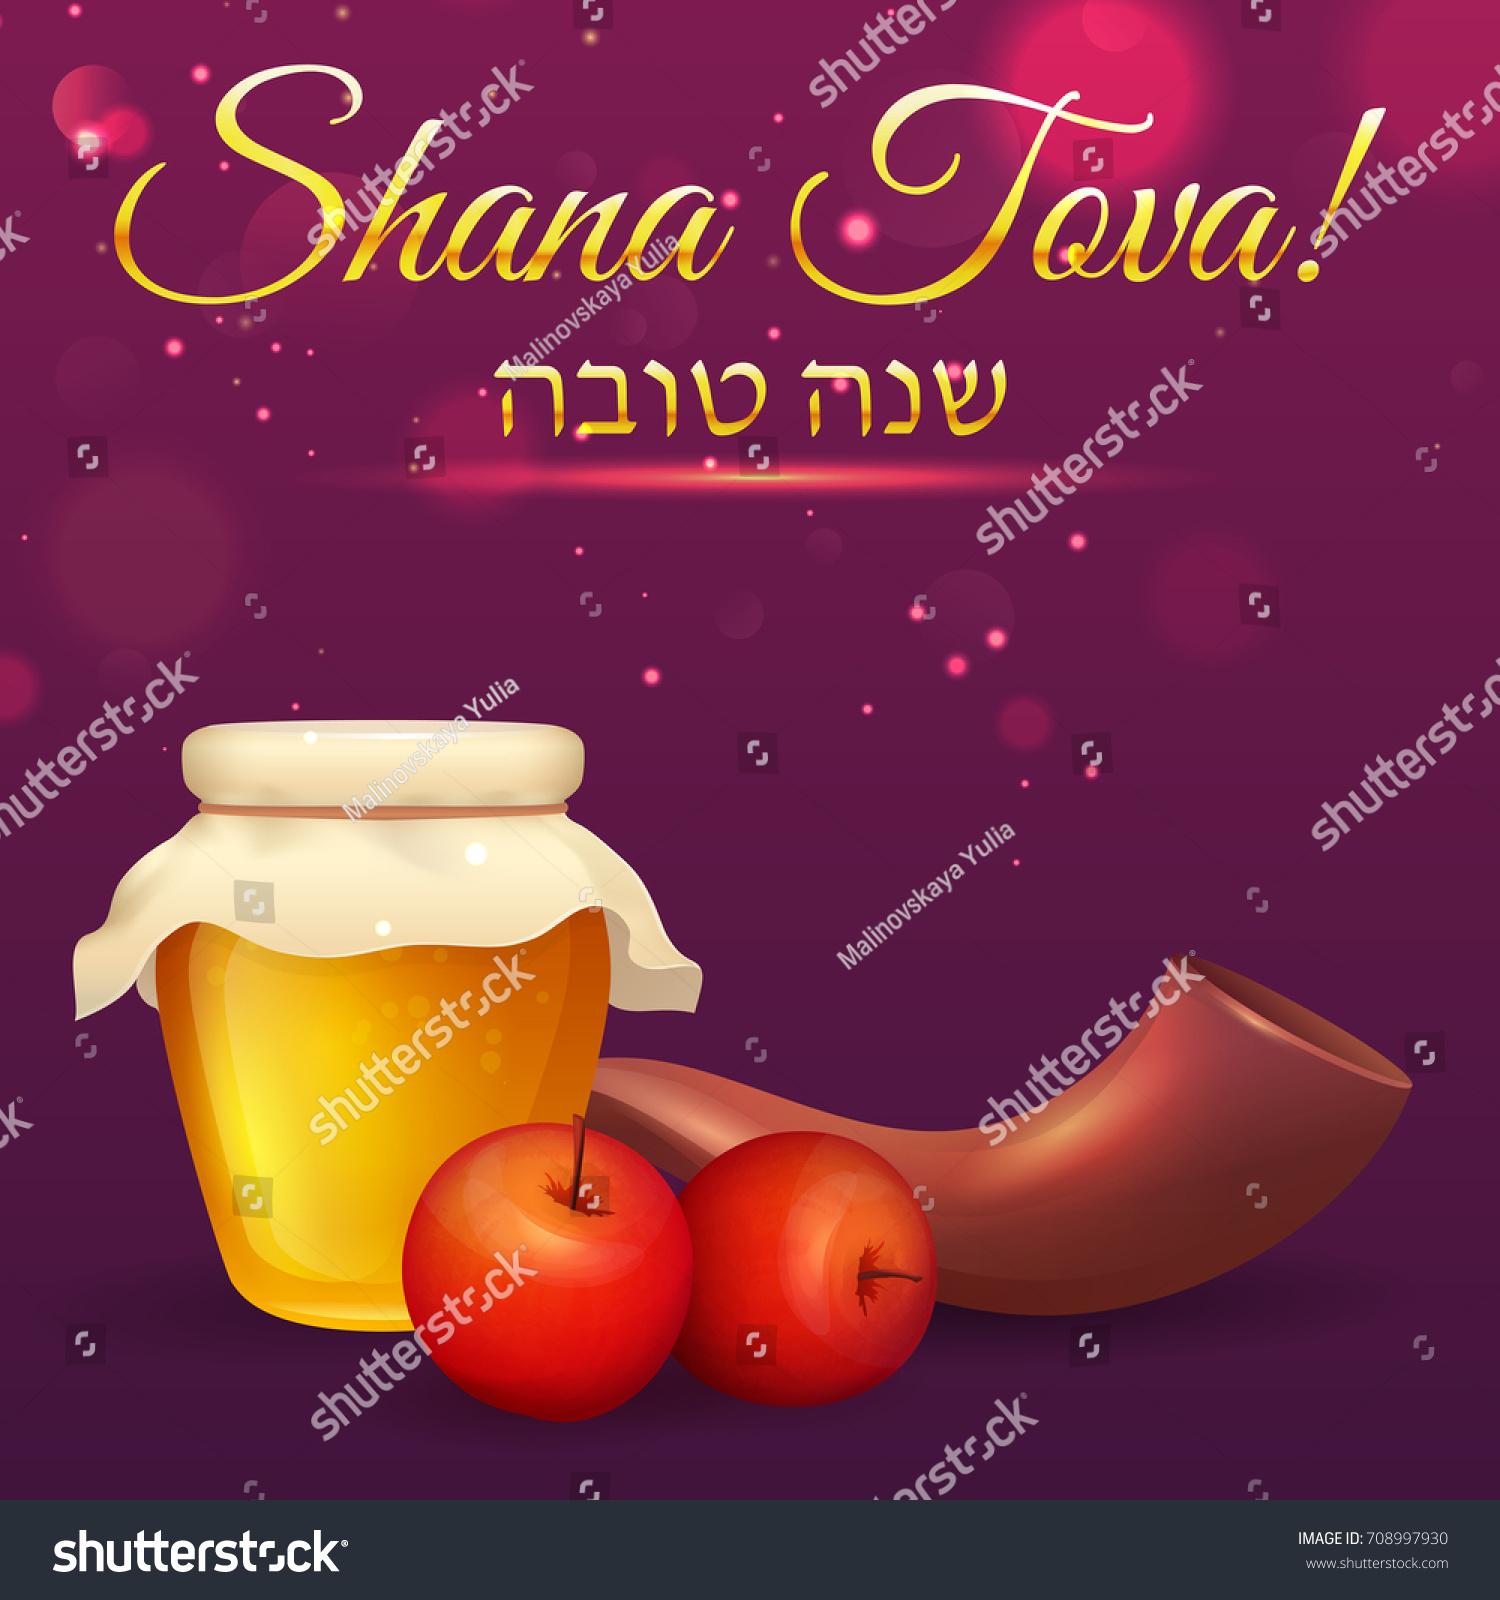 Shana tova rosh hashanah greeting card stock vector 708997930 shana tova rosh hashanah greeting card jewish new year vector illustration kristyandbryce Images